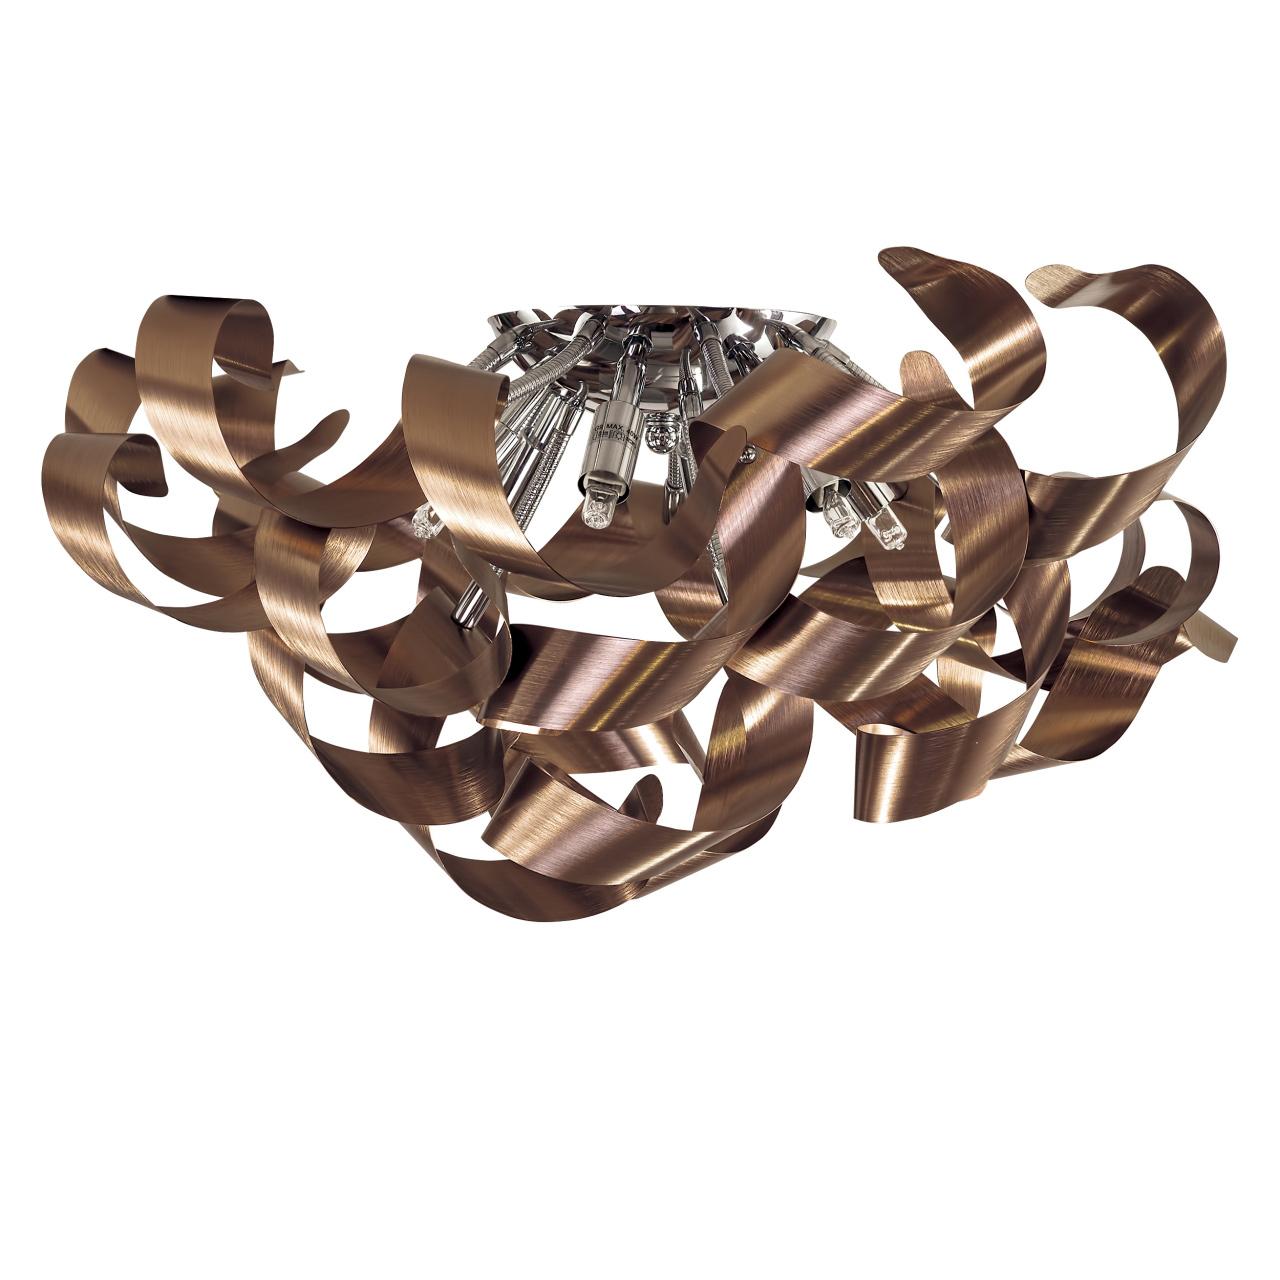 Люстра потолочная Turbio 6х40W G9 темная медь Lightstar 754068